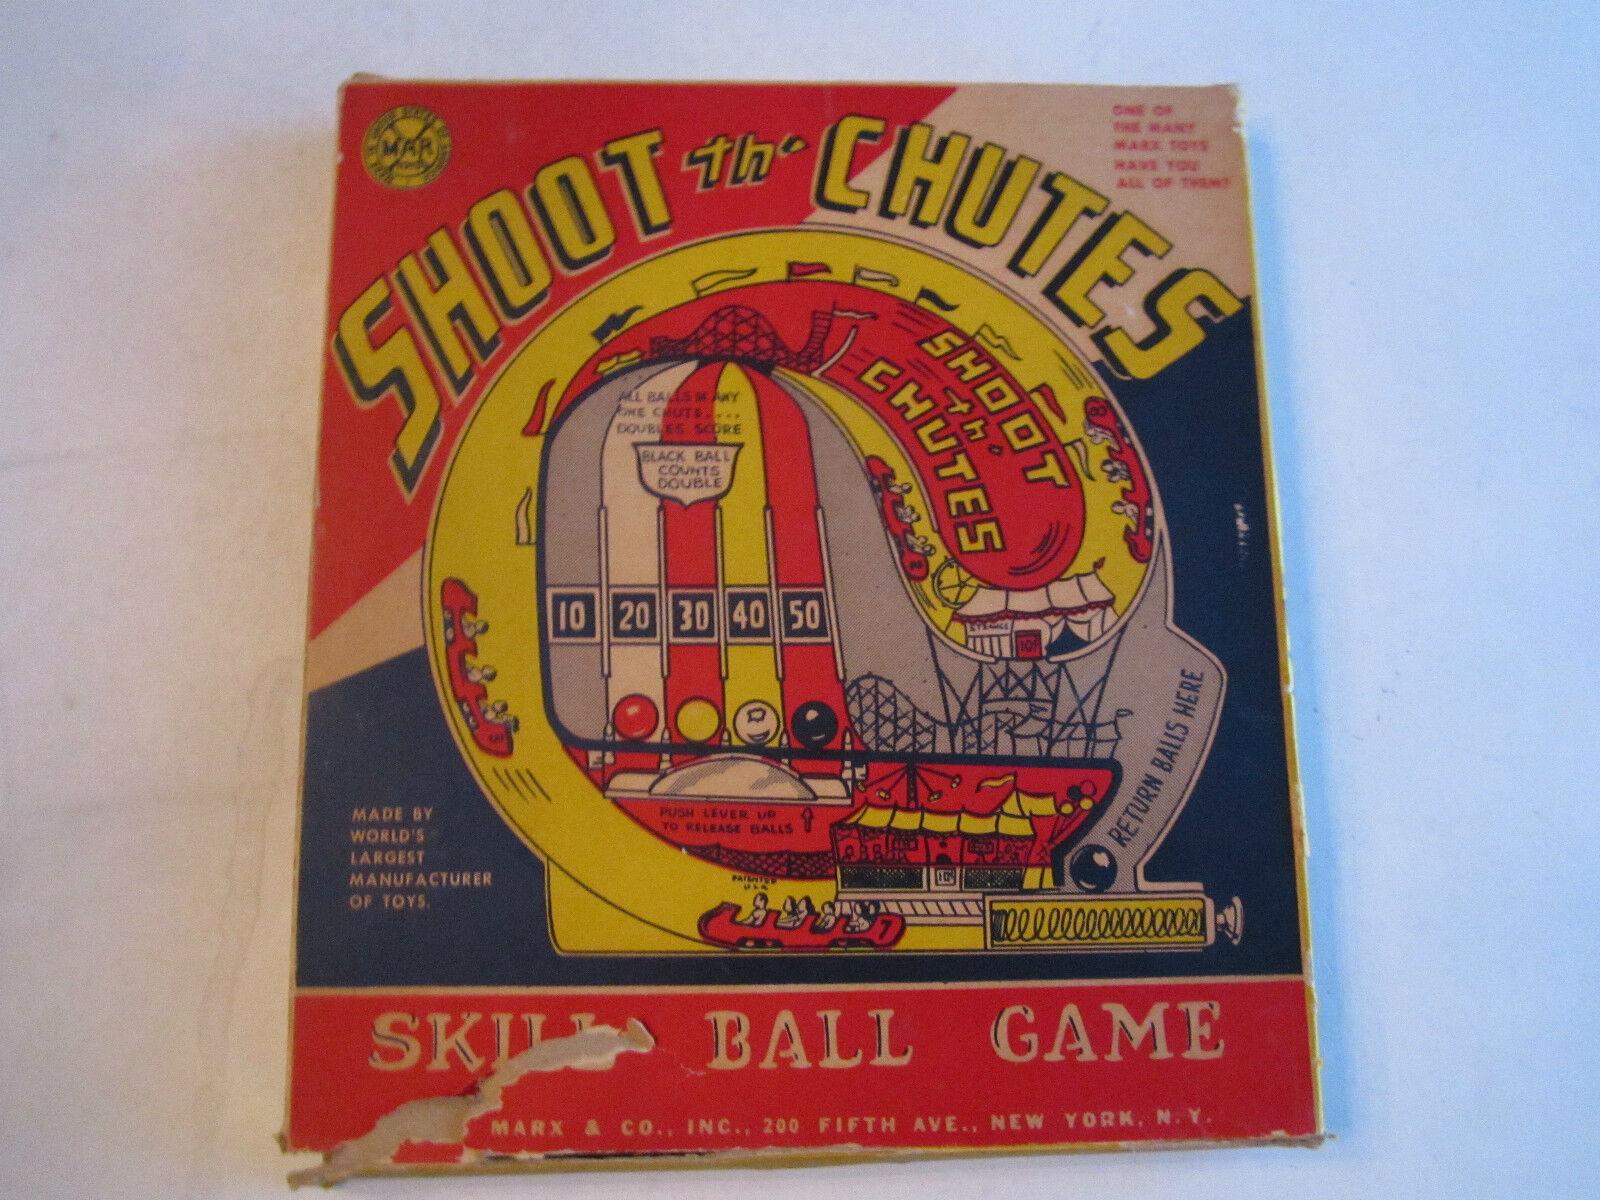 VINTAGE MARX TOY - SHOOT THE CHUTES SKILL BALL GAME IN ORIGINAL BOX- TUB CCC